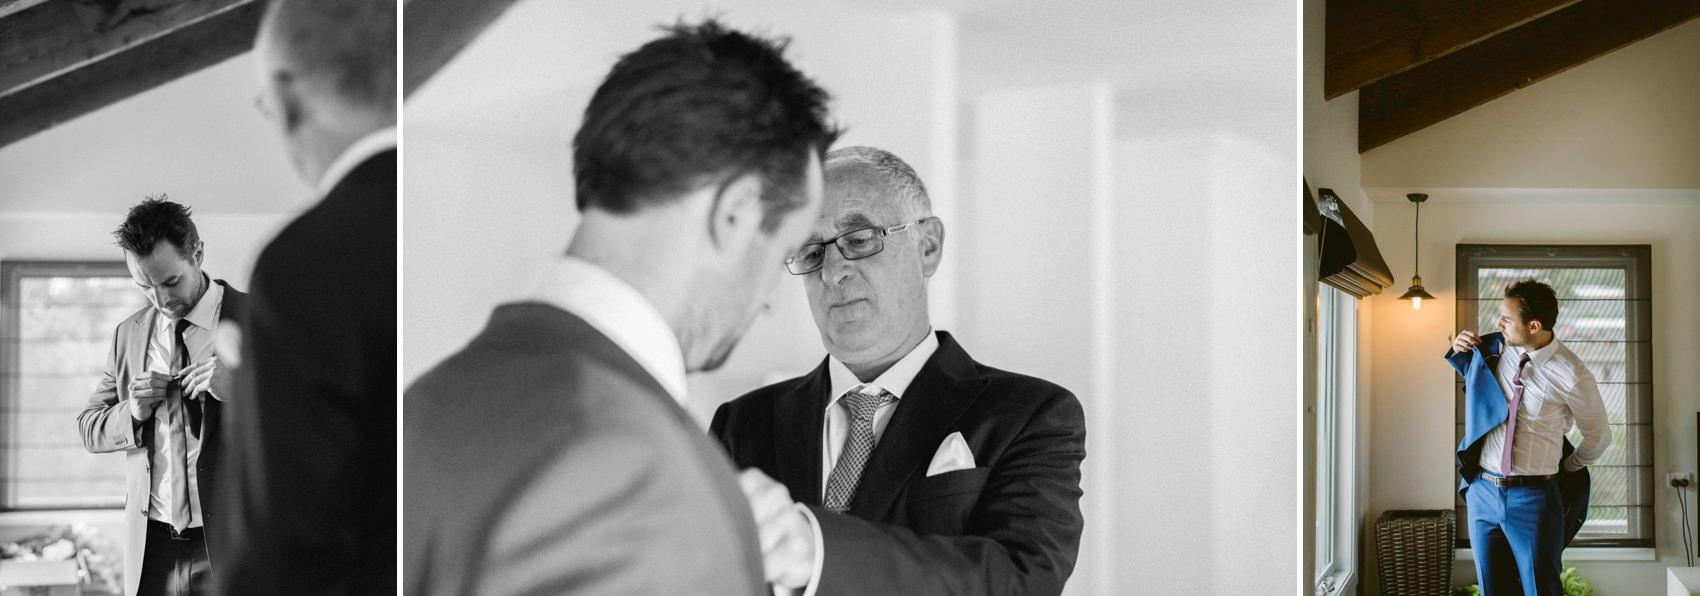 Montsalvat-Wedding-Photography_0107